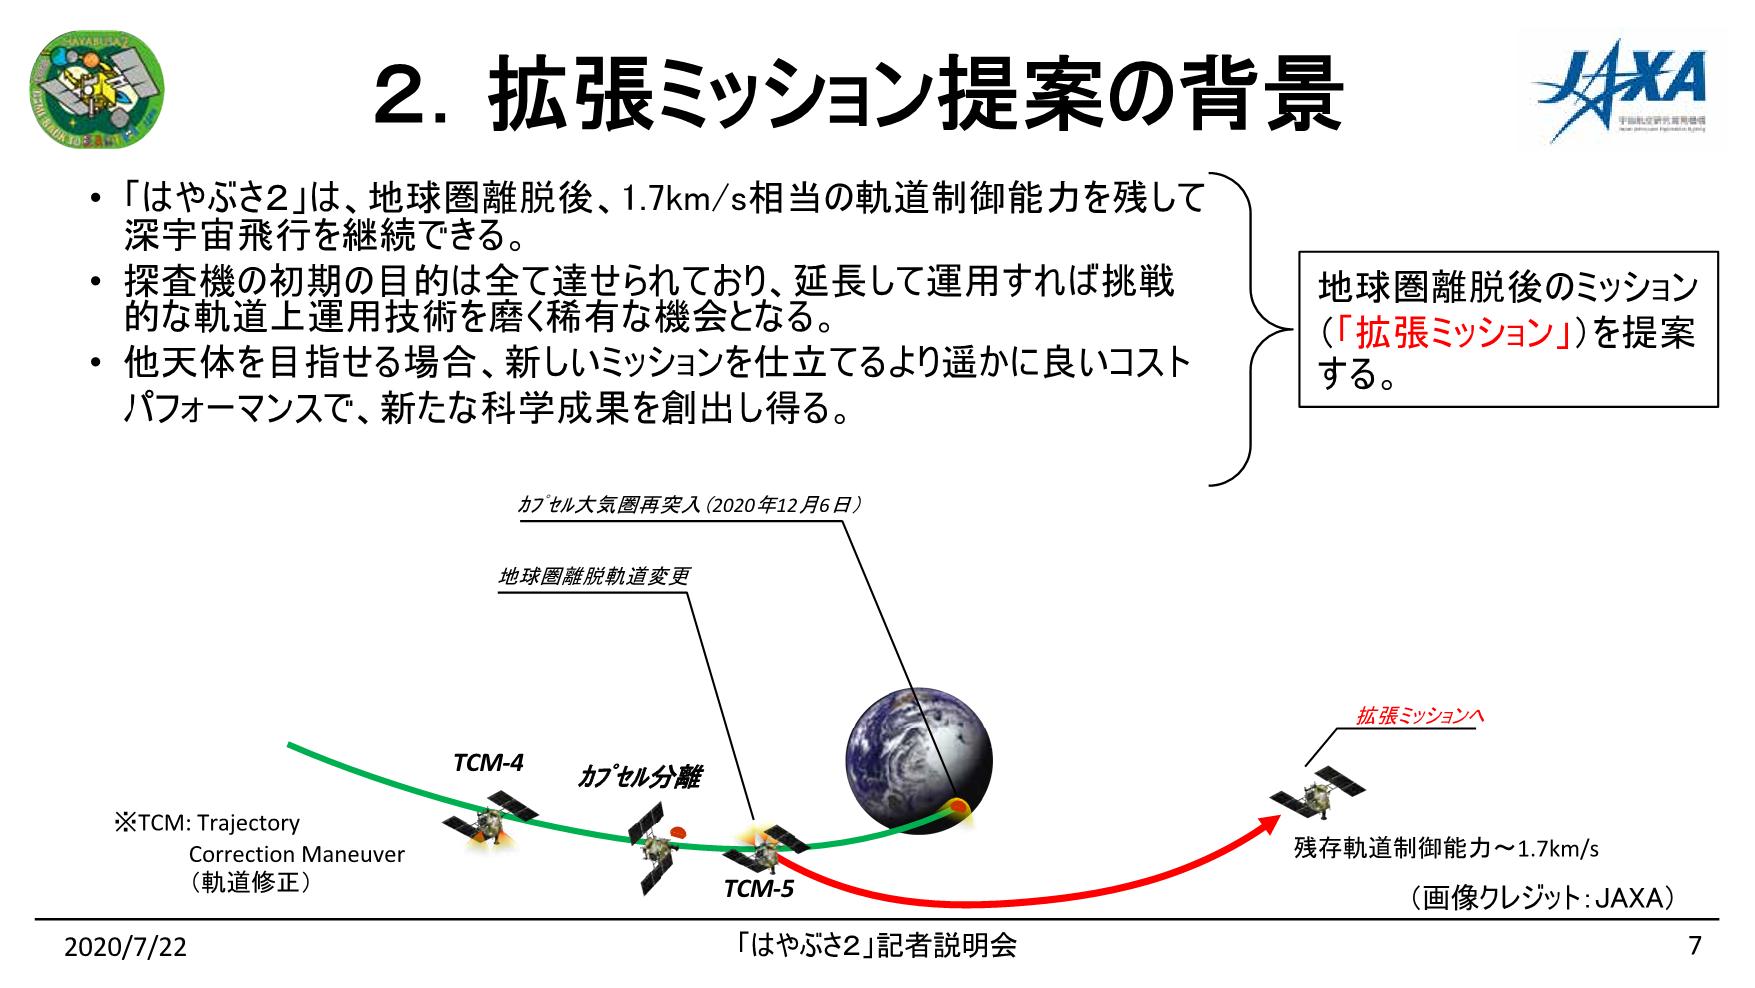 f:id:Imamura:20200722140649p:plain